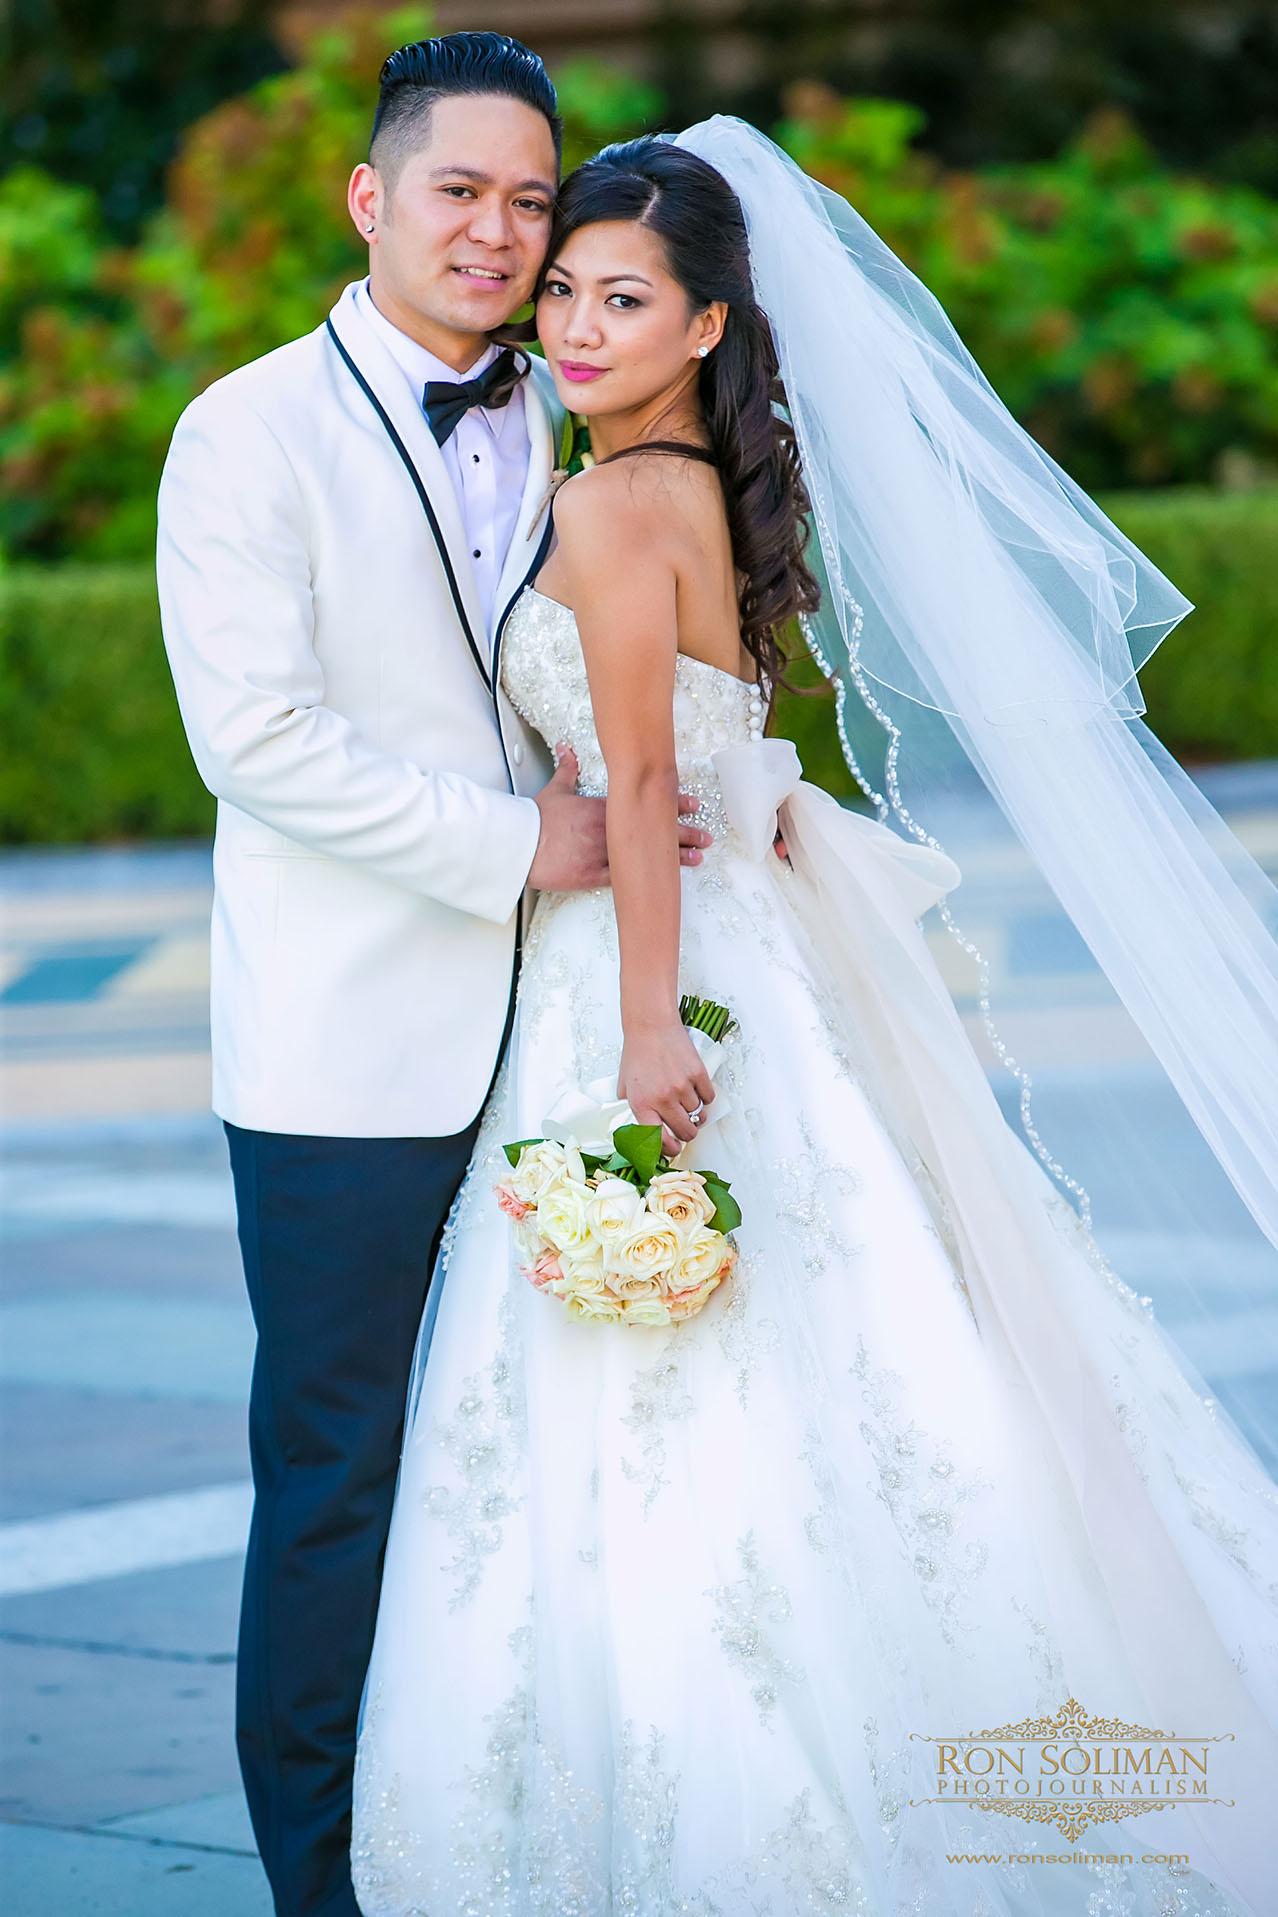 Best Wedding photos at BALLROOM AT THE BEN WEDDING